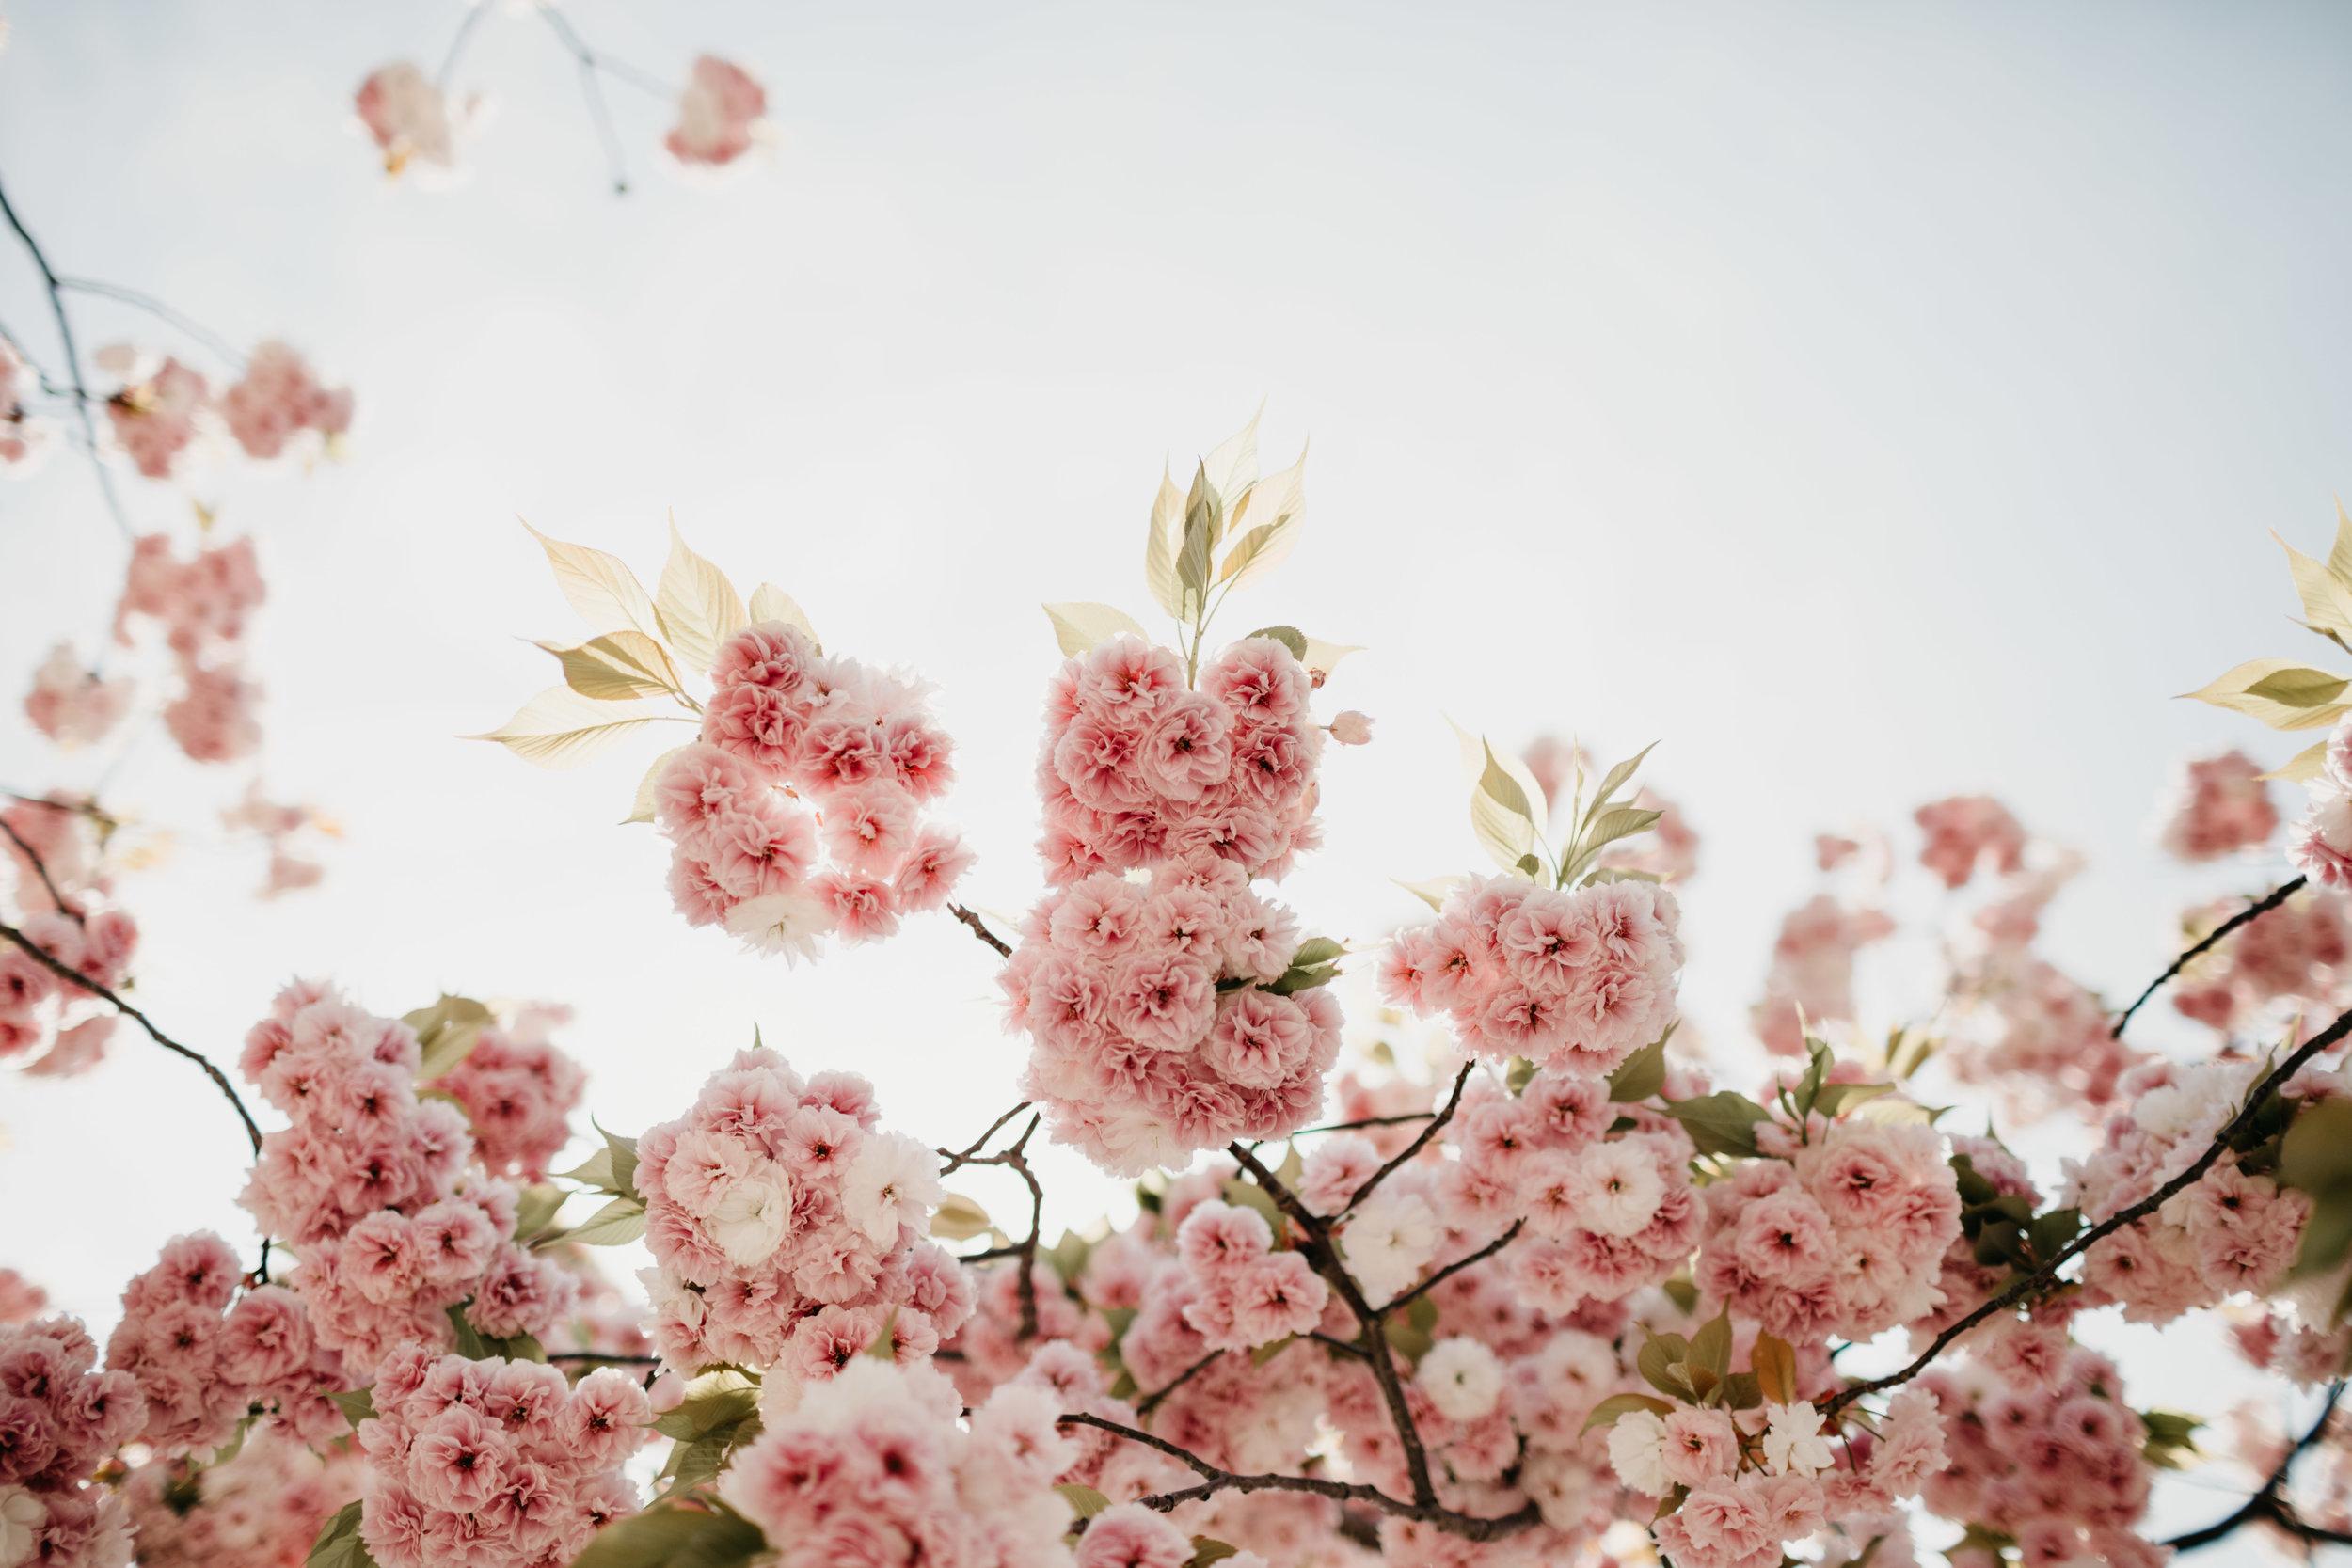 sakura-tokyo-photo-by-samantha-look.jpg